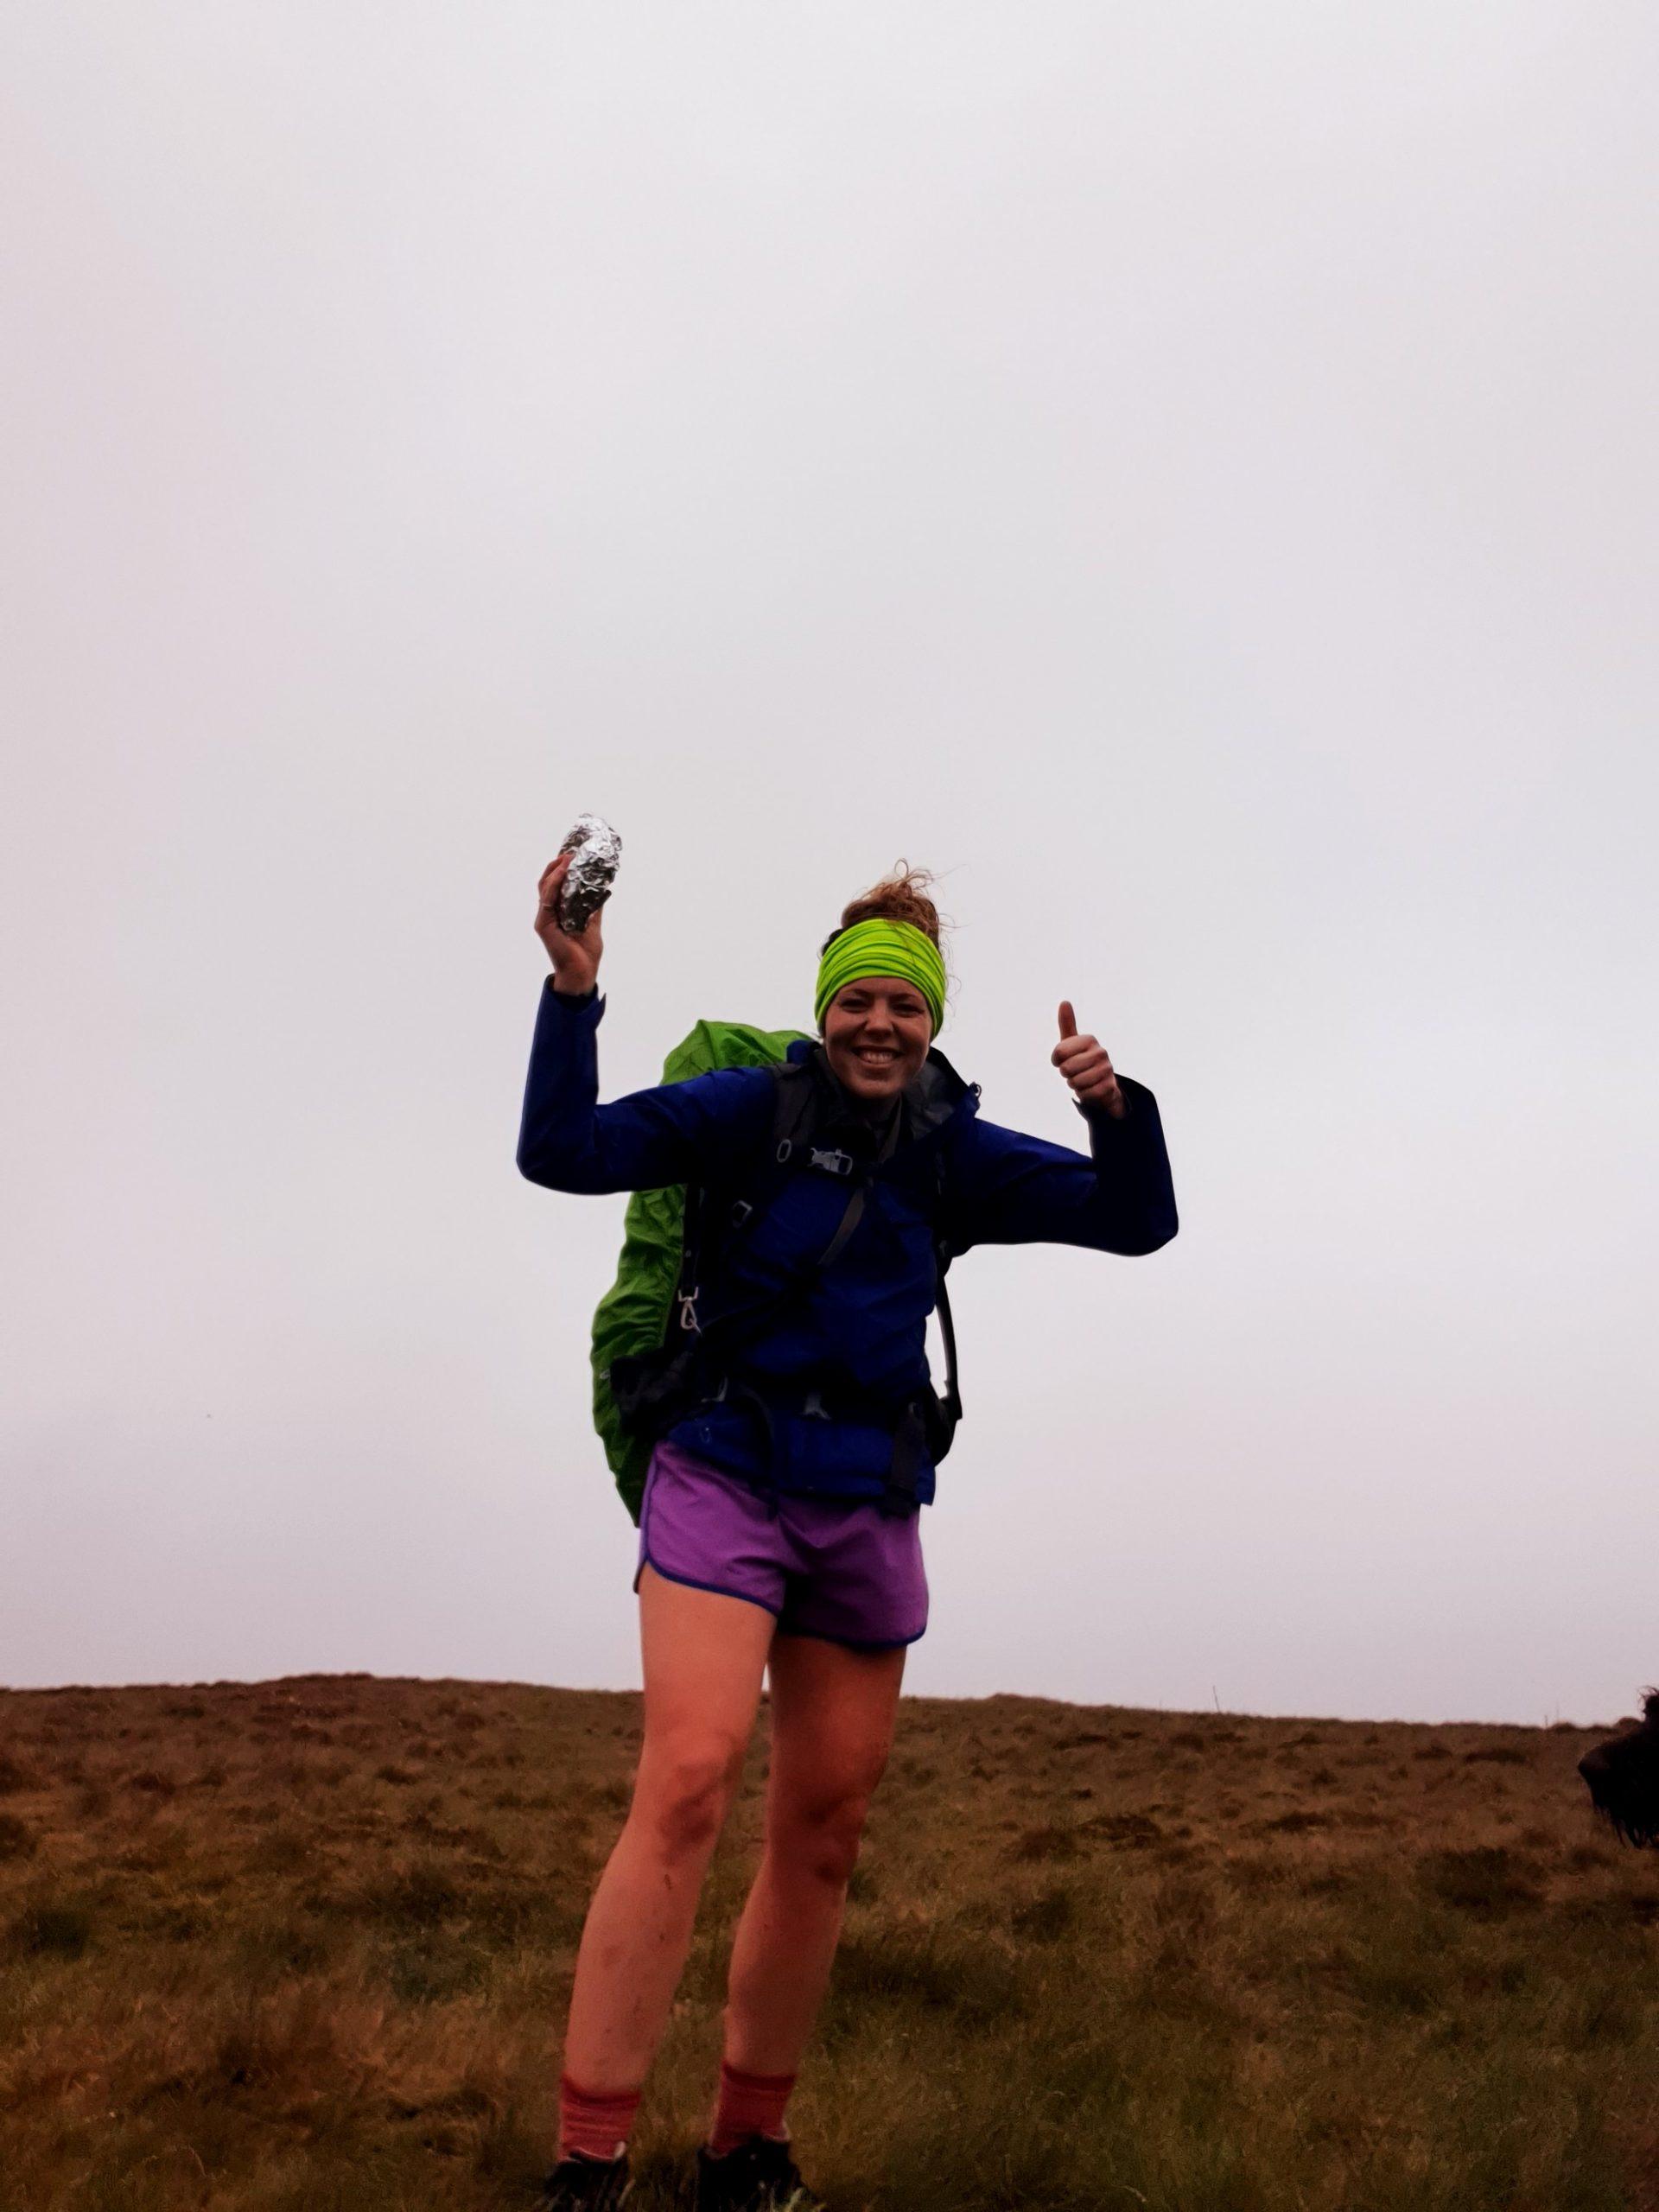 Megan Bennett's West Highland Way Adventure for the YAA